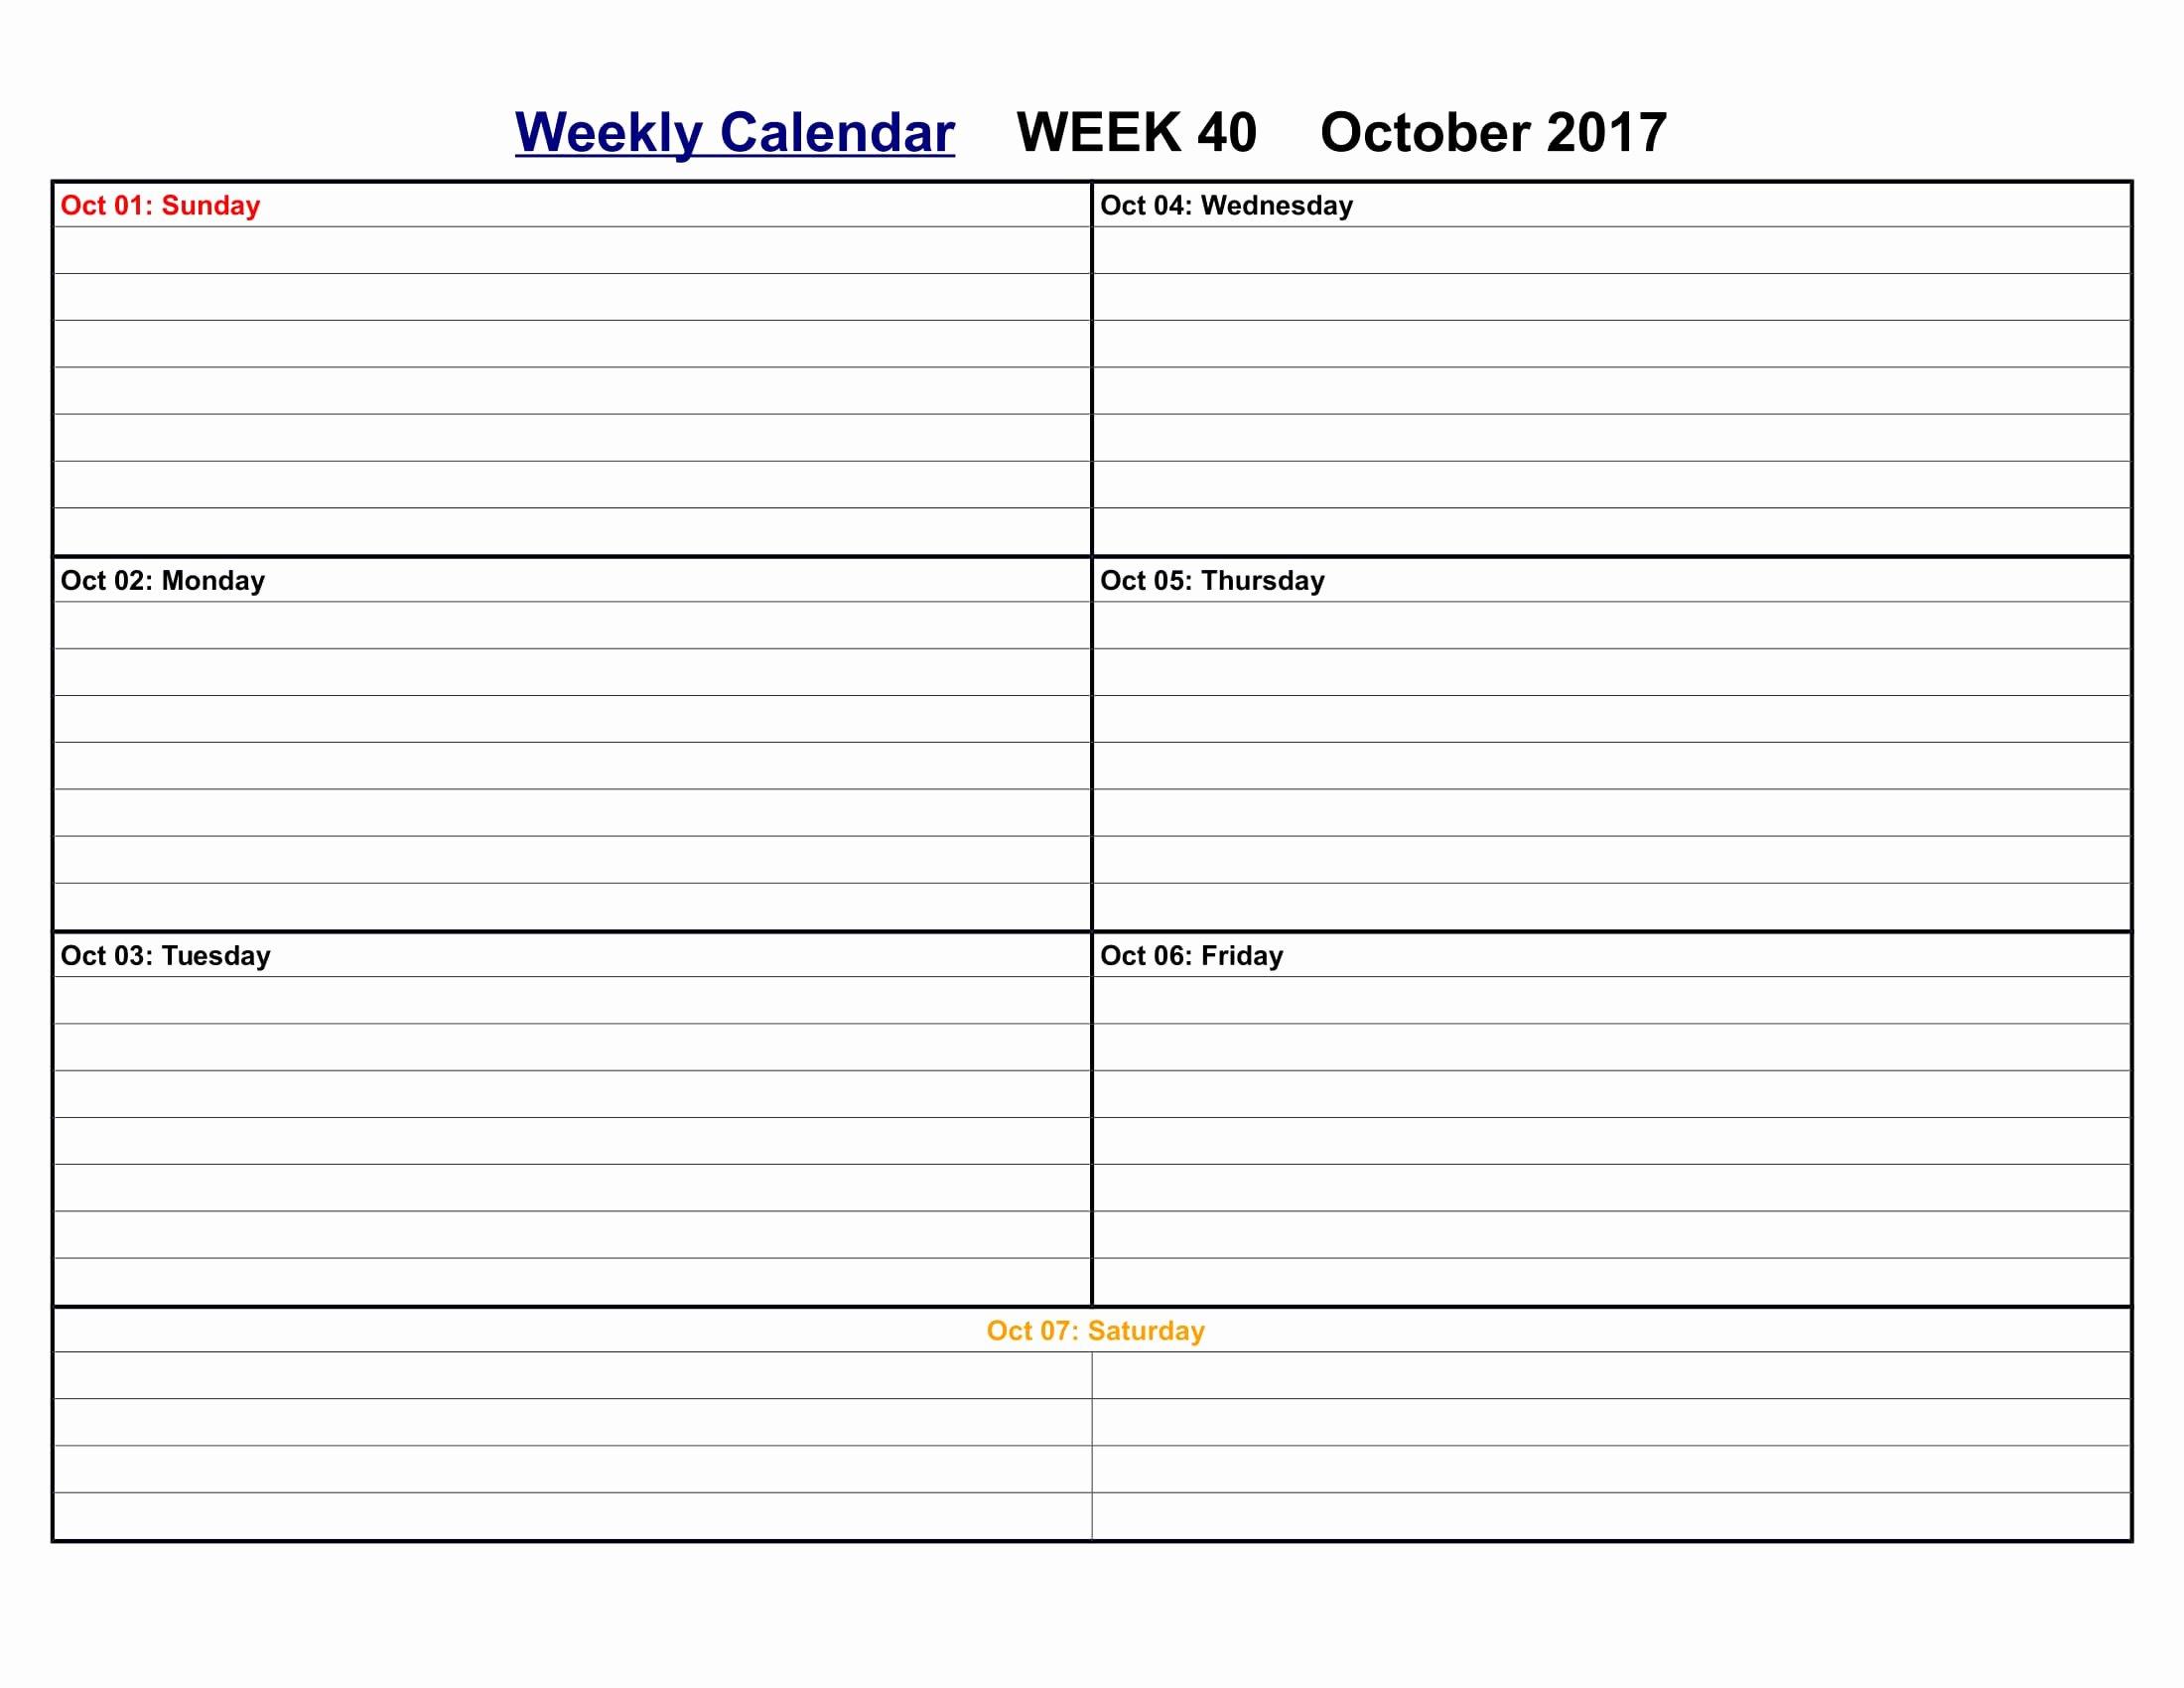 Weekly Calendar Template 2017 Elegant October 2017 Calendar Printable Templates Calendar Fice